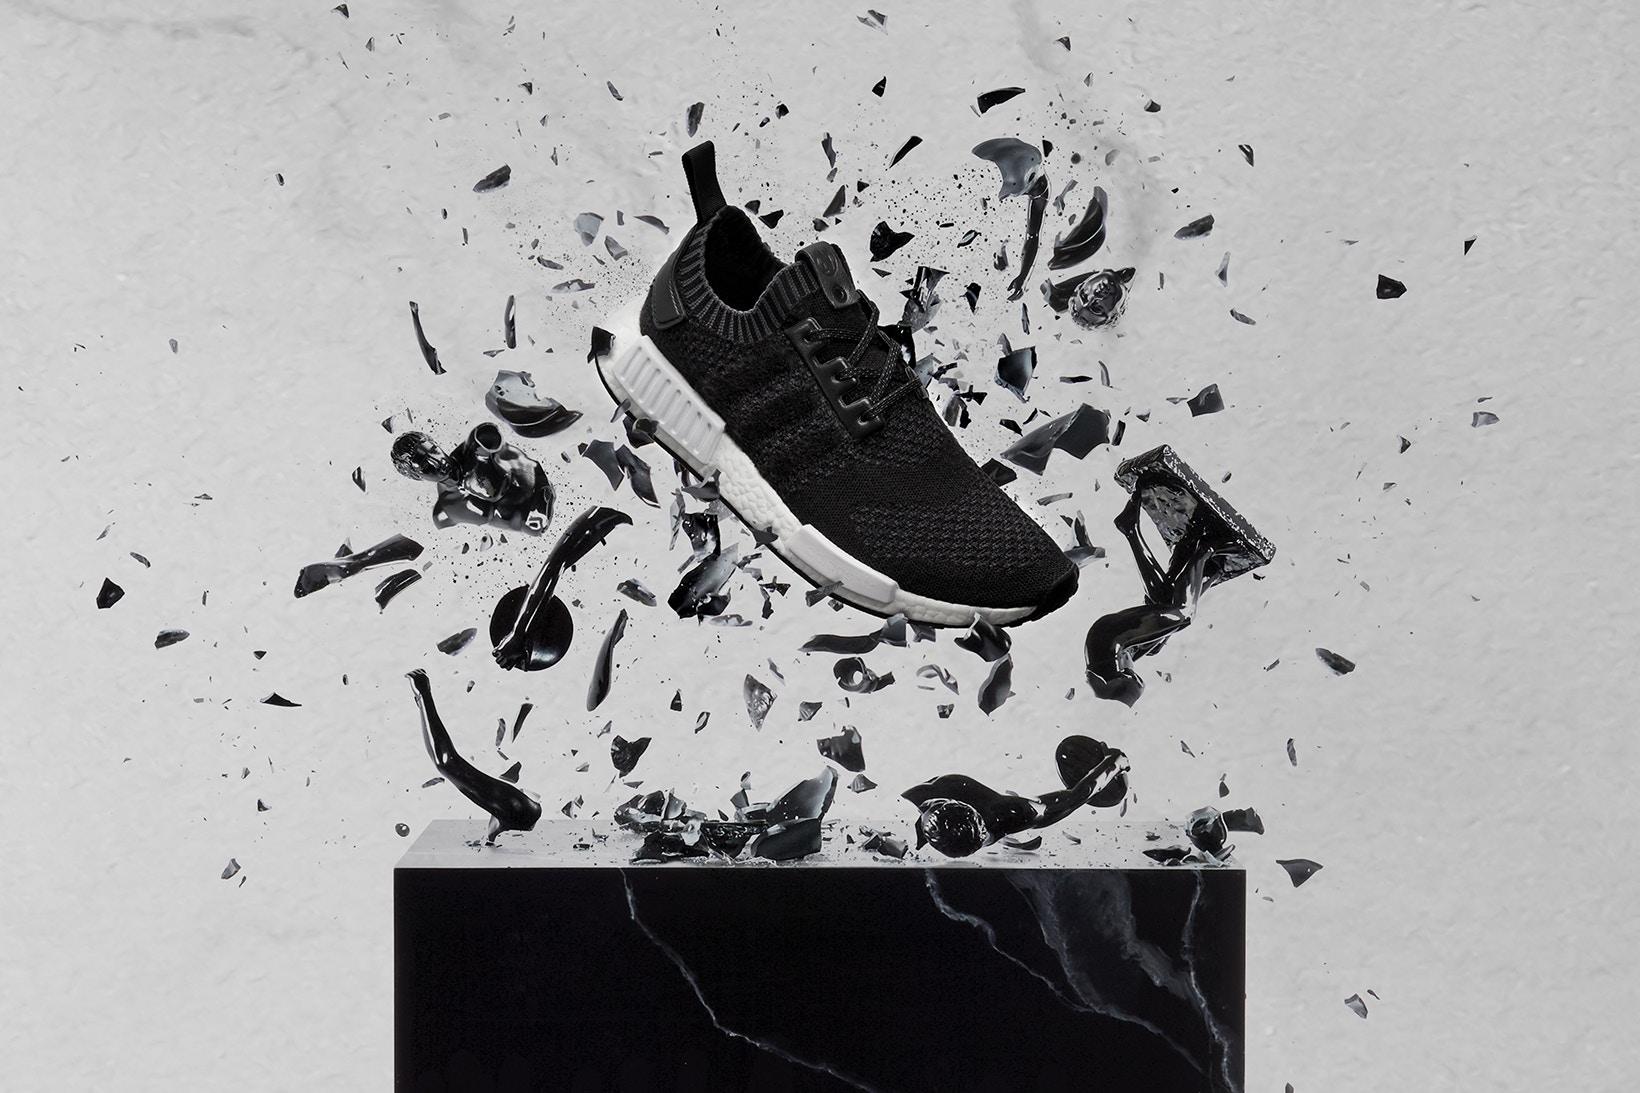 adidas-consortium-sneaker-exchange-invincible-a-ma-maniere-4.jpg